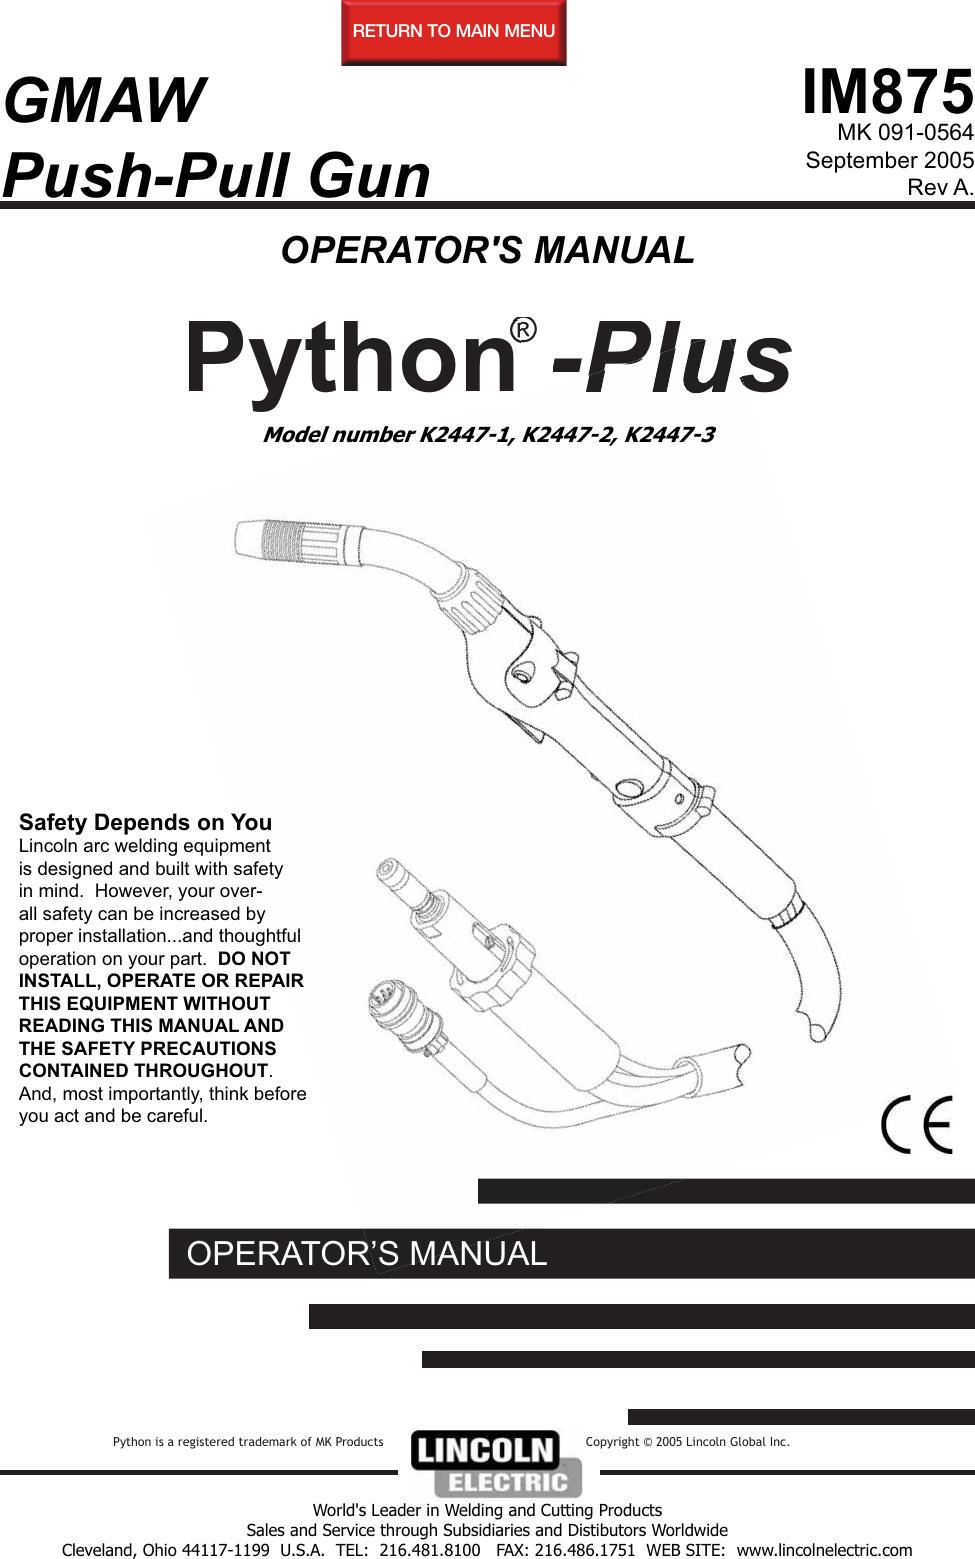 Lincoln Electric Python Plus K2447 1 Users Manual Im875 Mark Iii Wiring Diagram